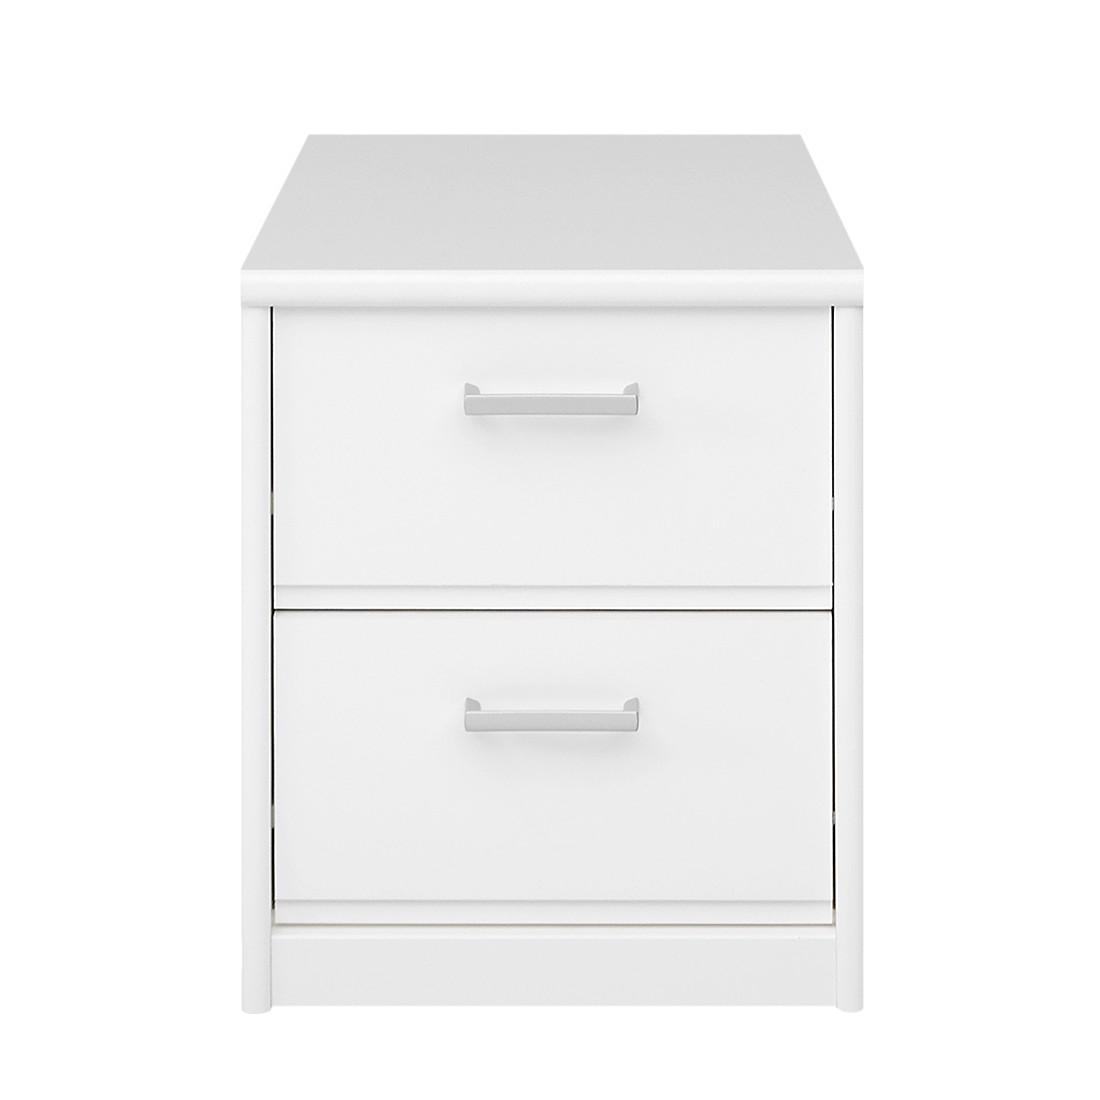 Comodino Soft Plus - Bianco, Cs Schmal